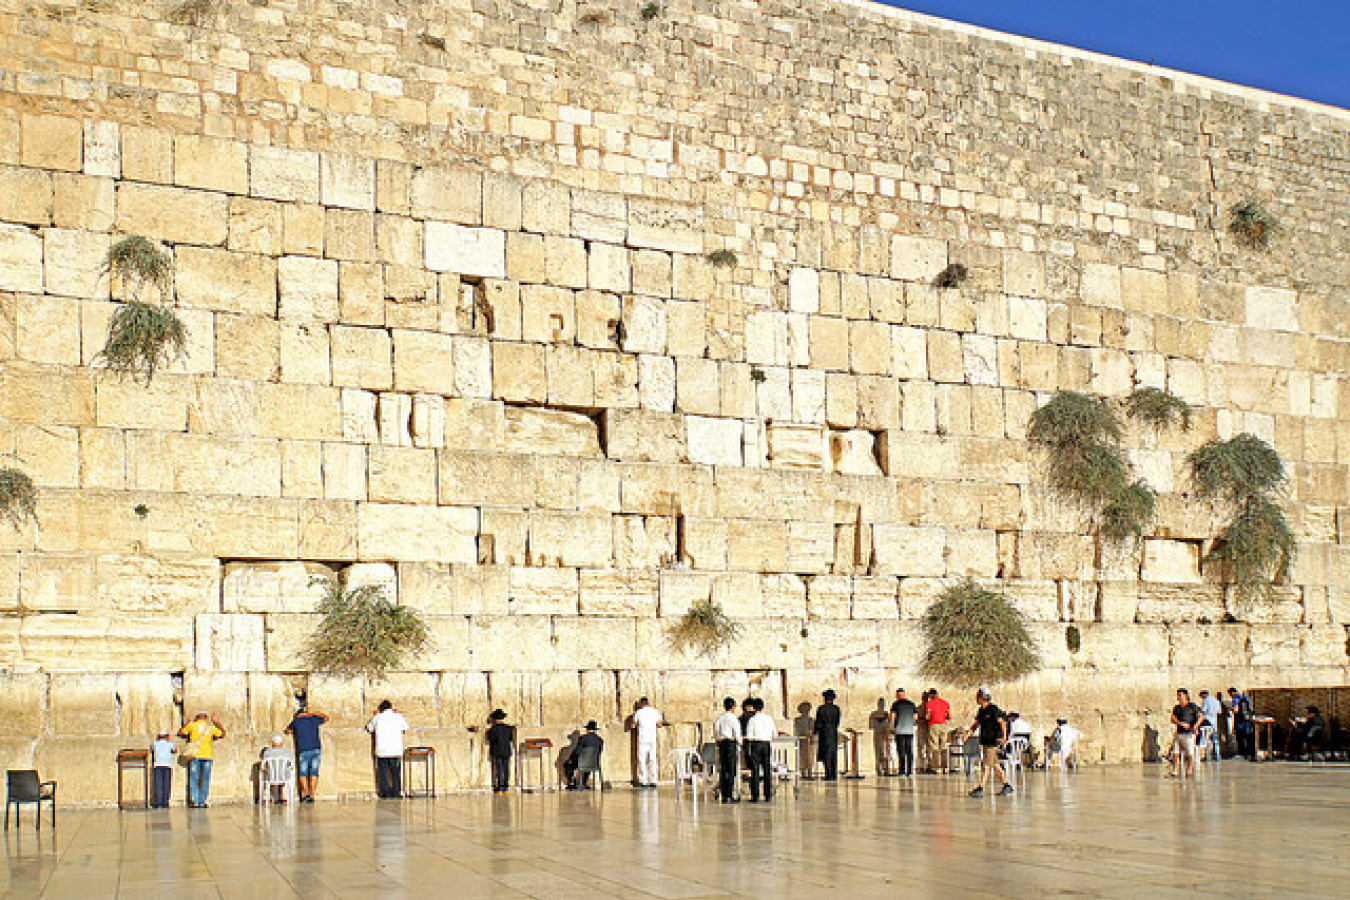 Israel-06898 - Wailing Wall